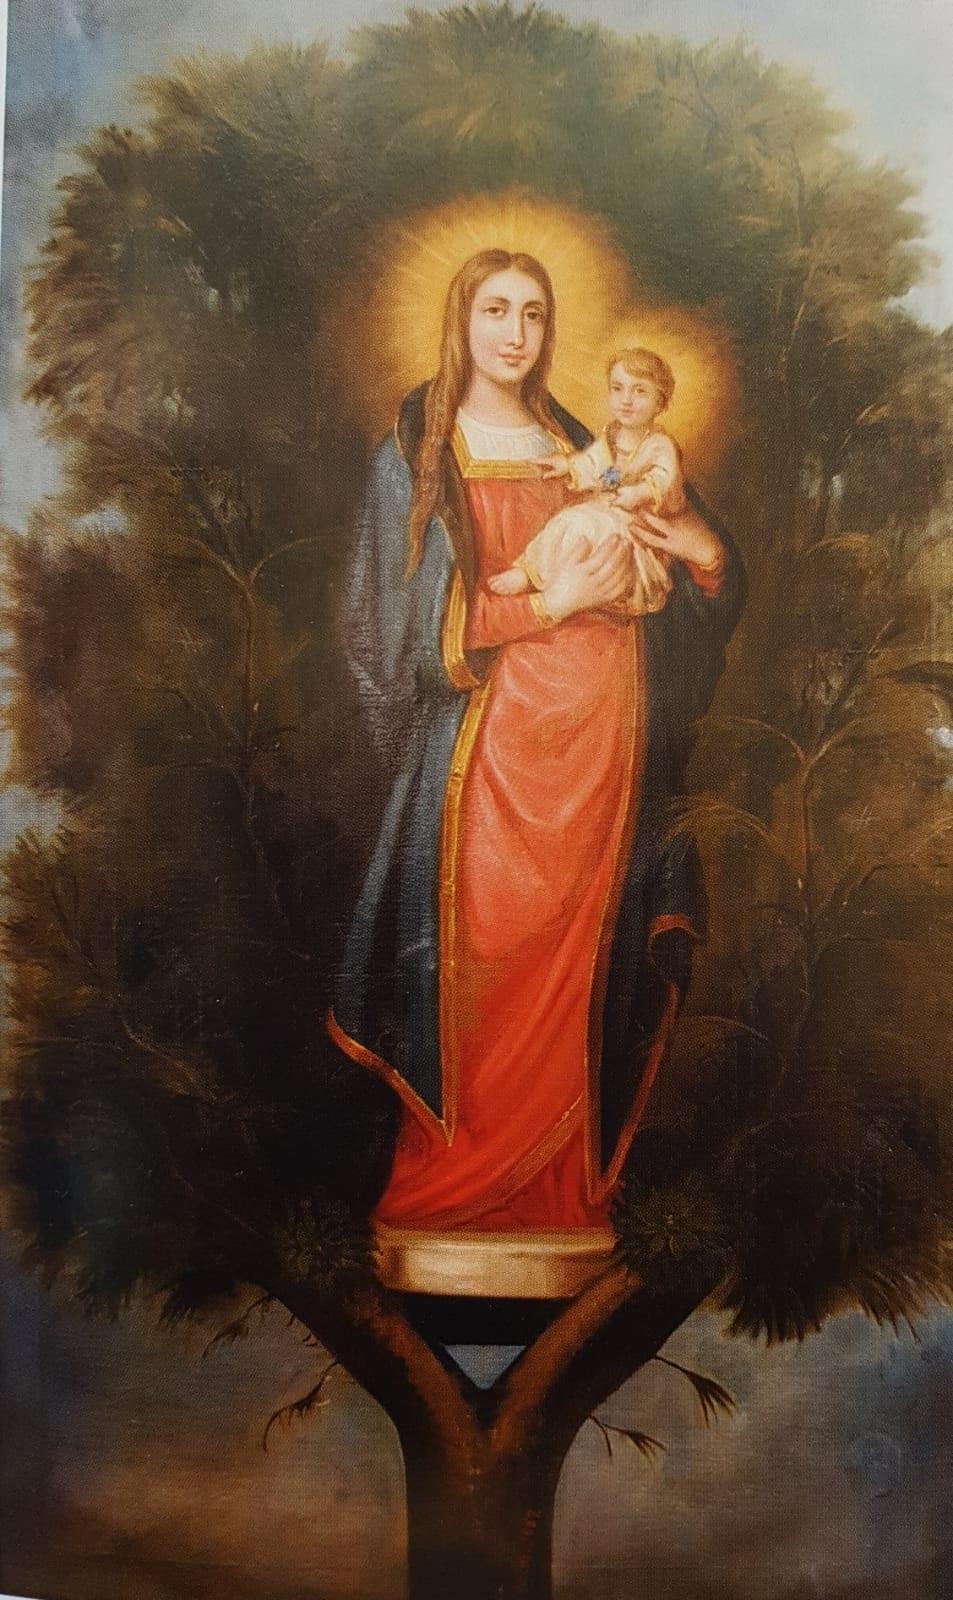 Cuadro Virgen del Pino